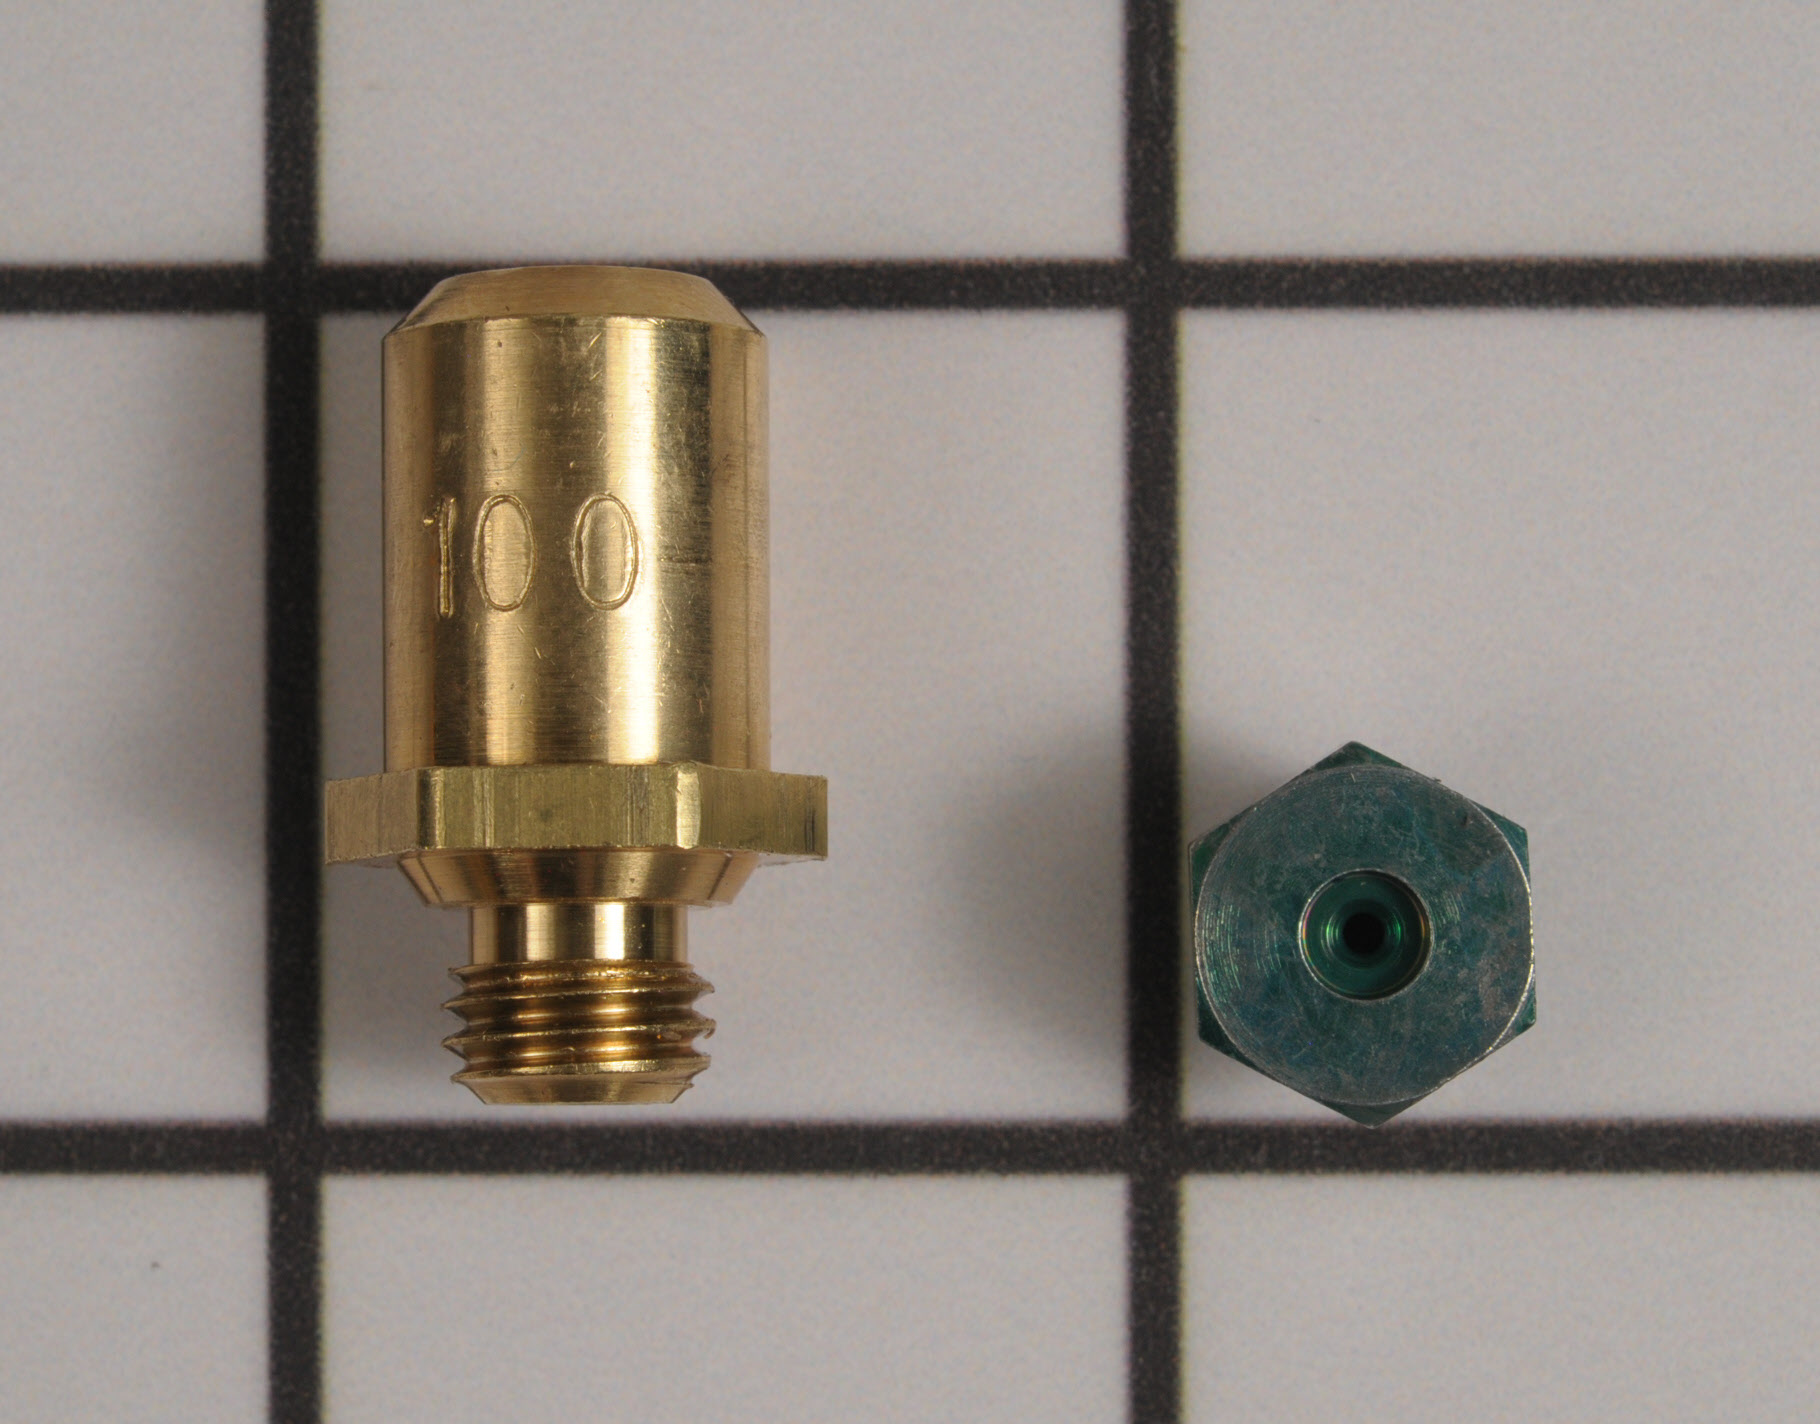 Whirlpool Range/Stove/Oven Part # W11087486 - Conversion Kit